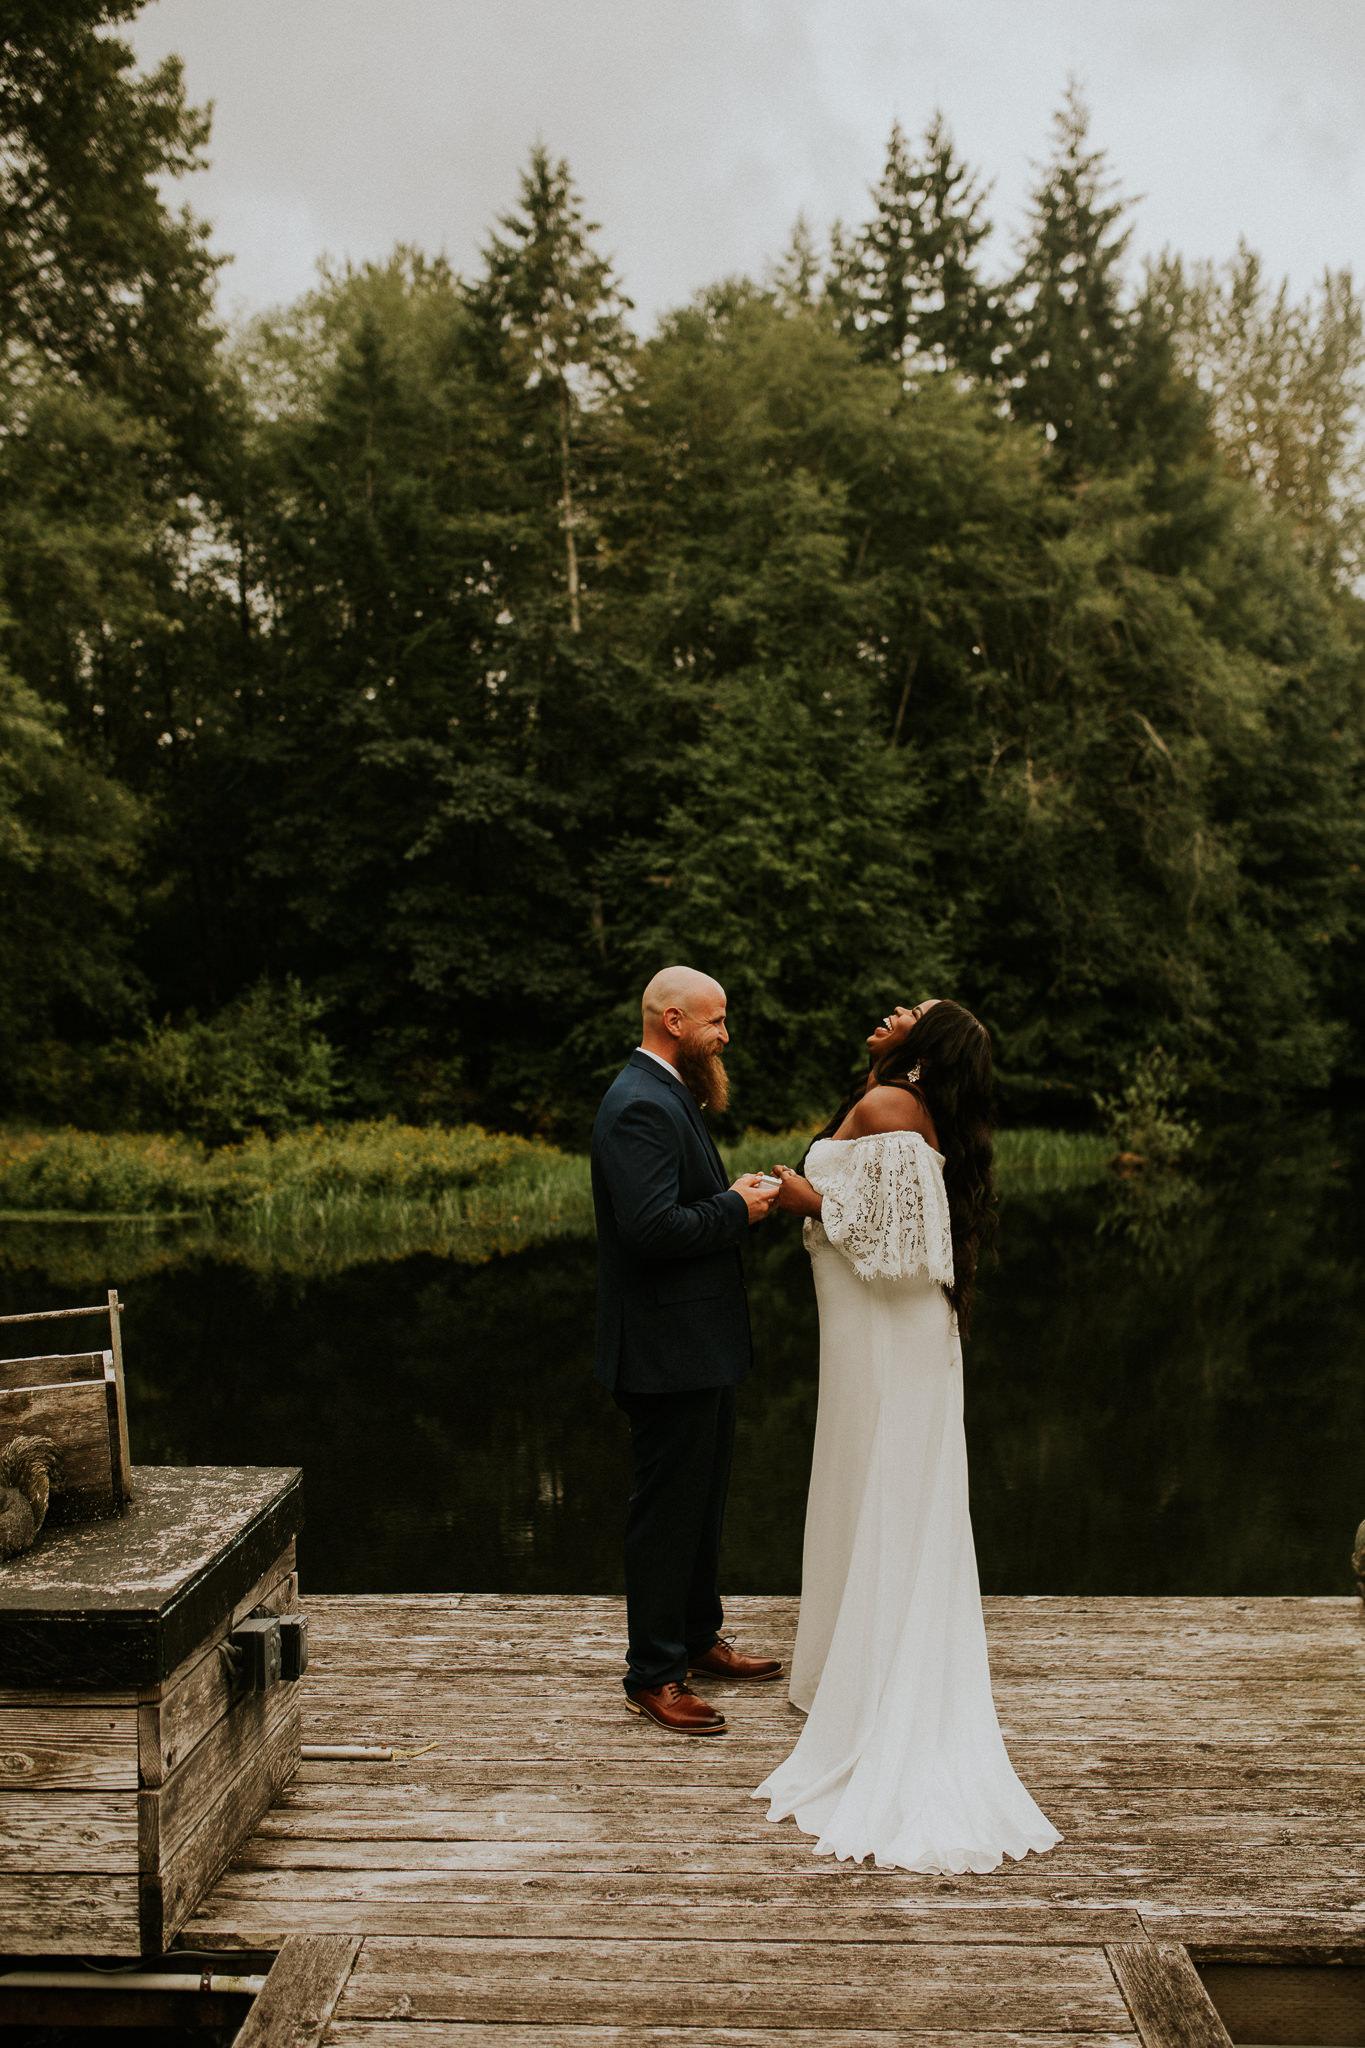 Lakeside-elopement-teasers-13.jpg